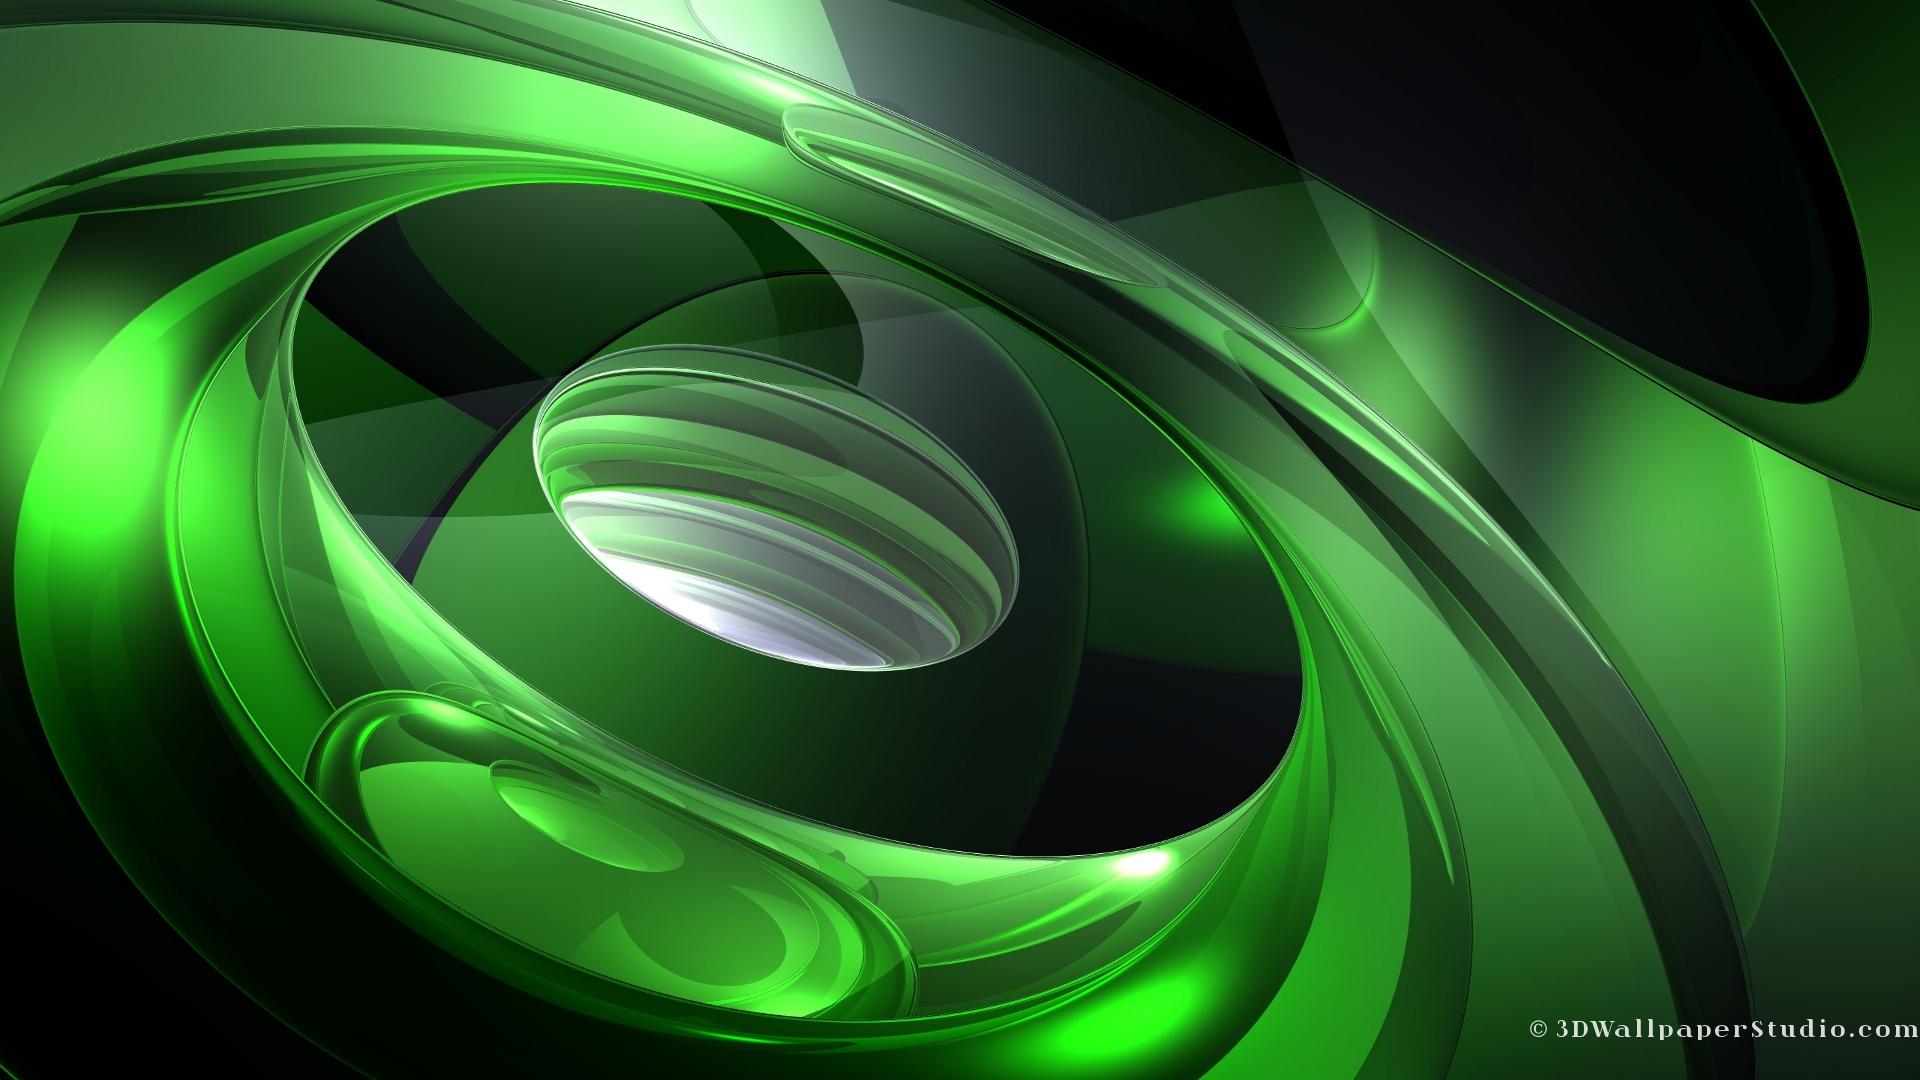 3D Wallpaper 3d abstract sound of green 1920 x 1080 1920x1080